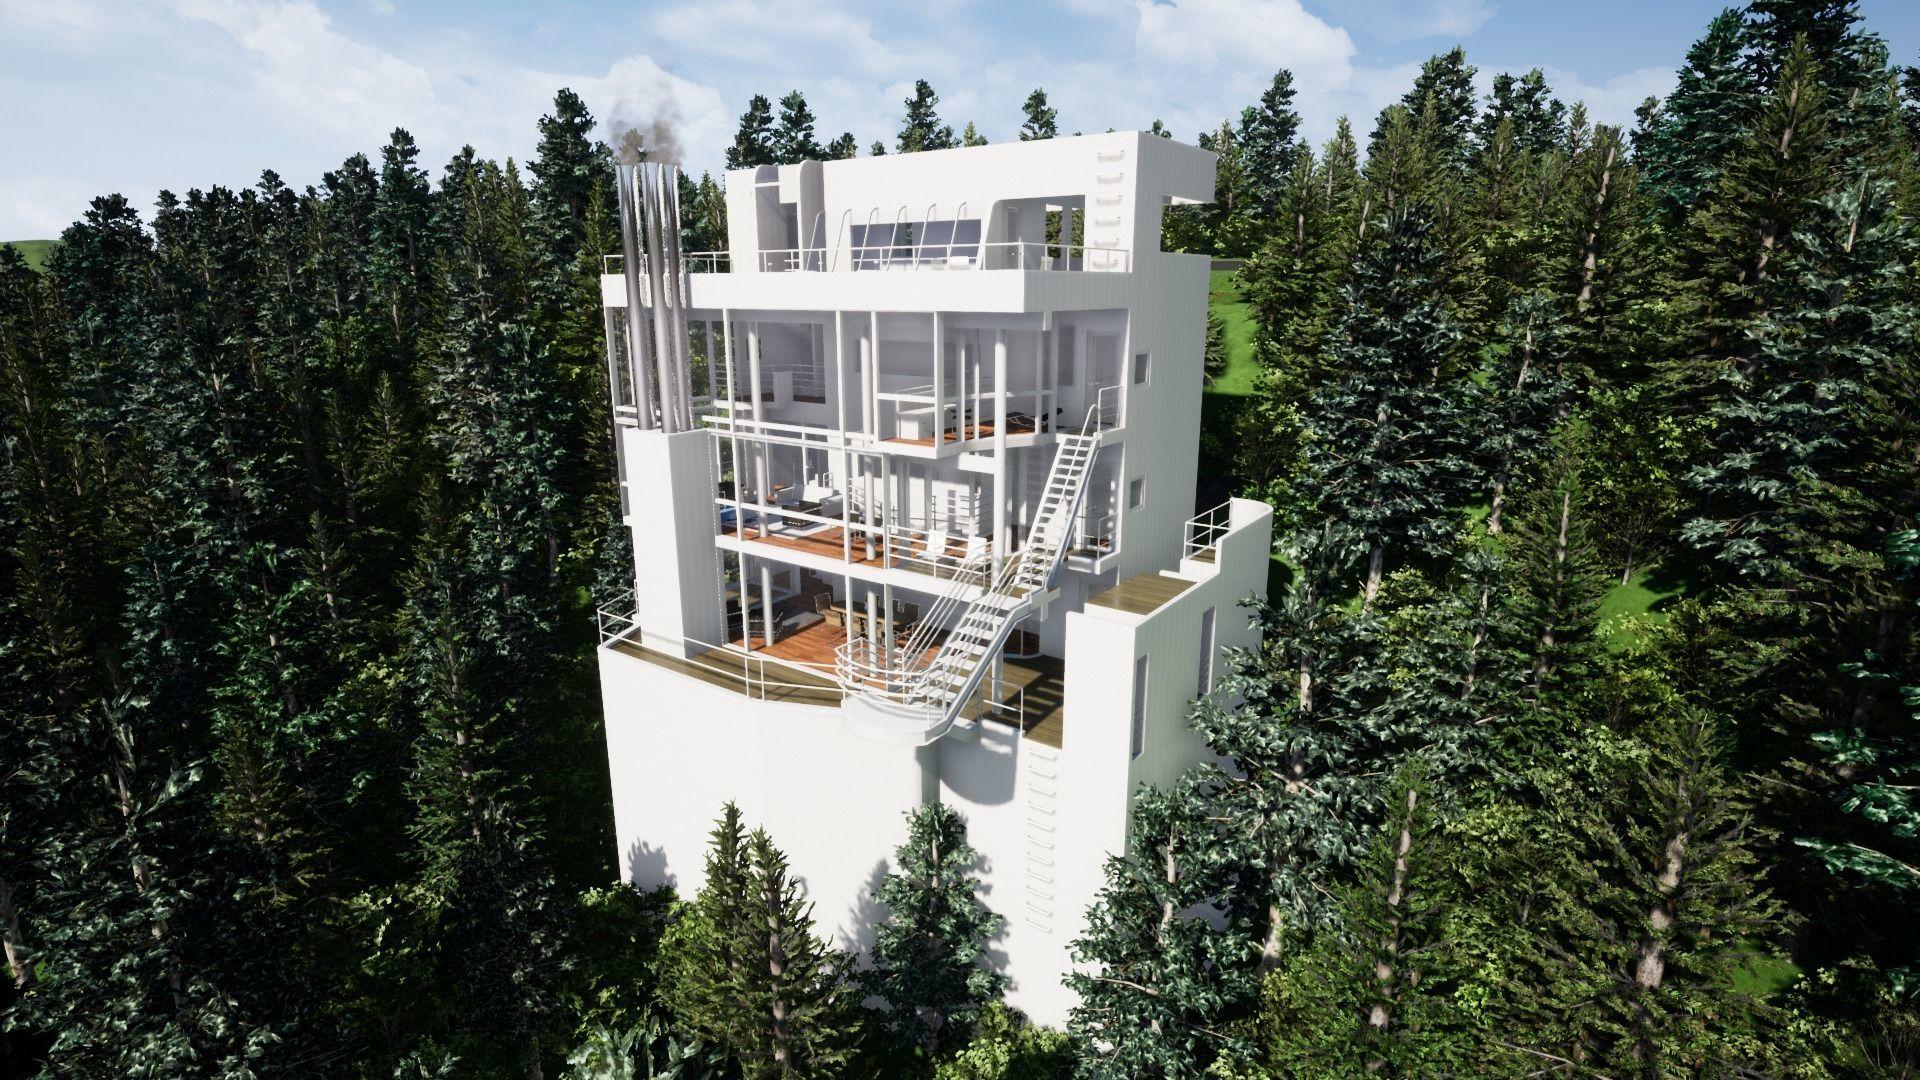 Richard Meier Douglas house an architectural masterpiece